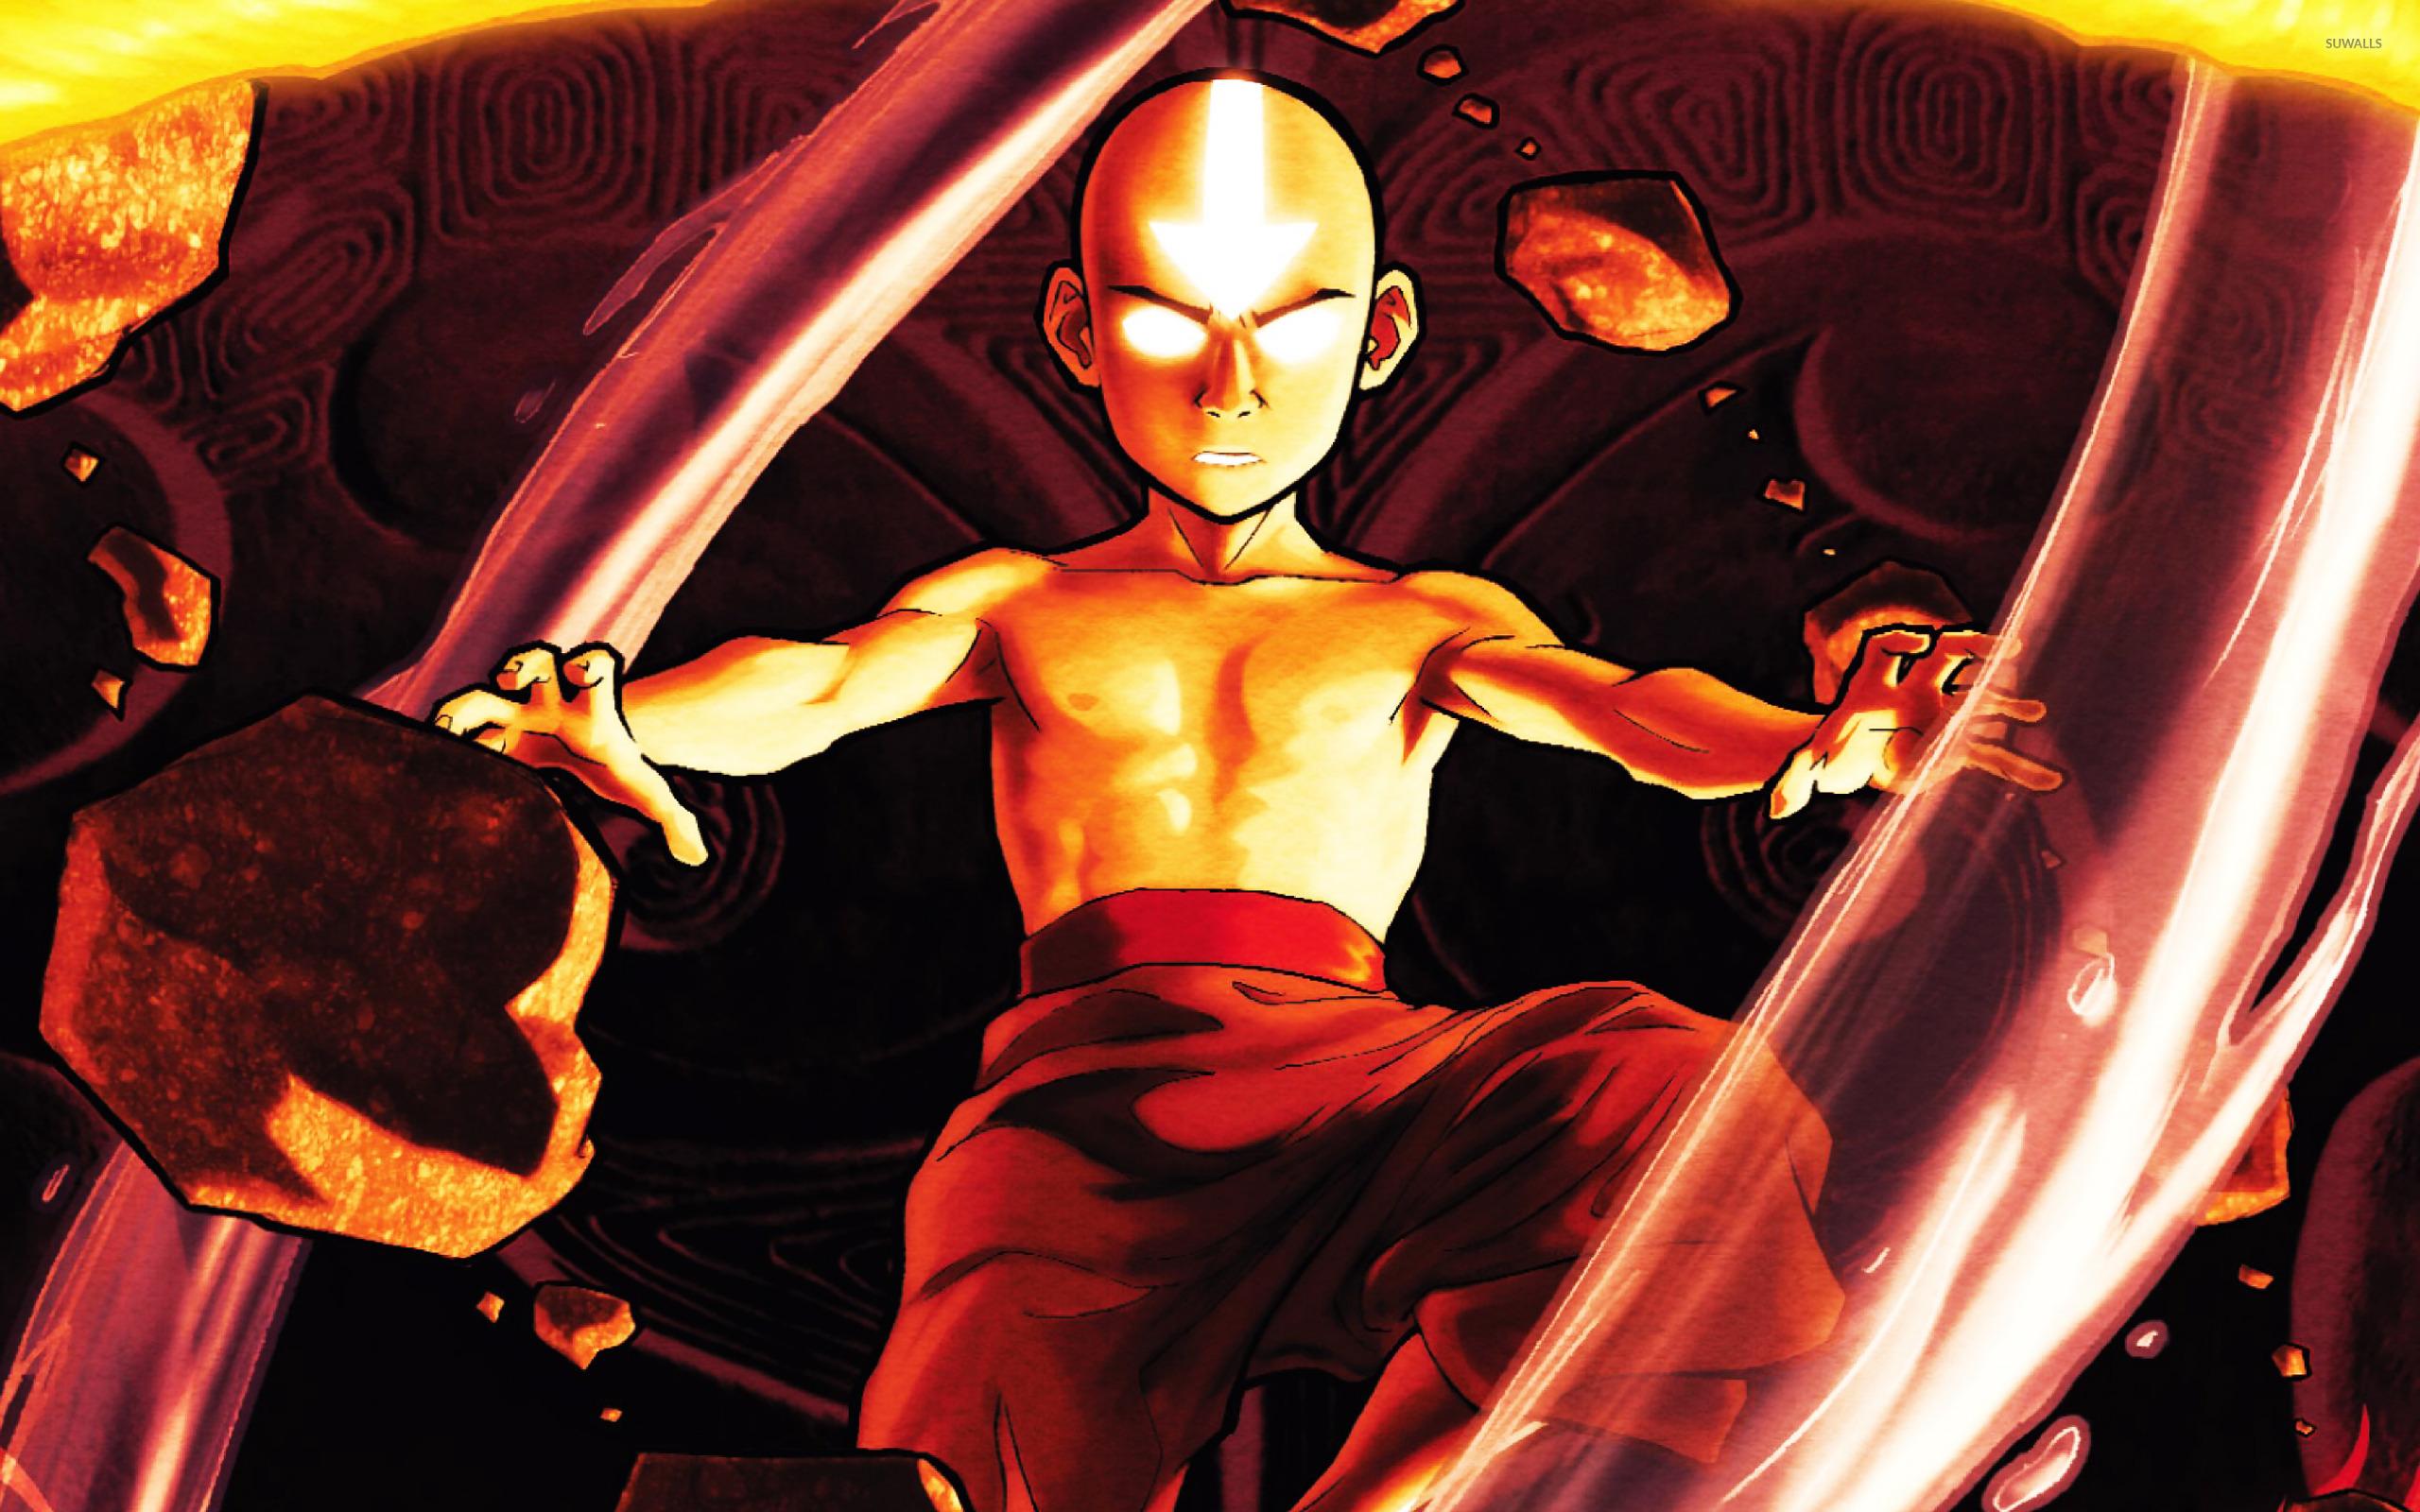 Aang - Avatar: The Last Airbender wallpaper - Anime ...